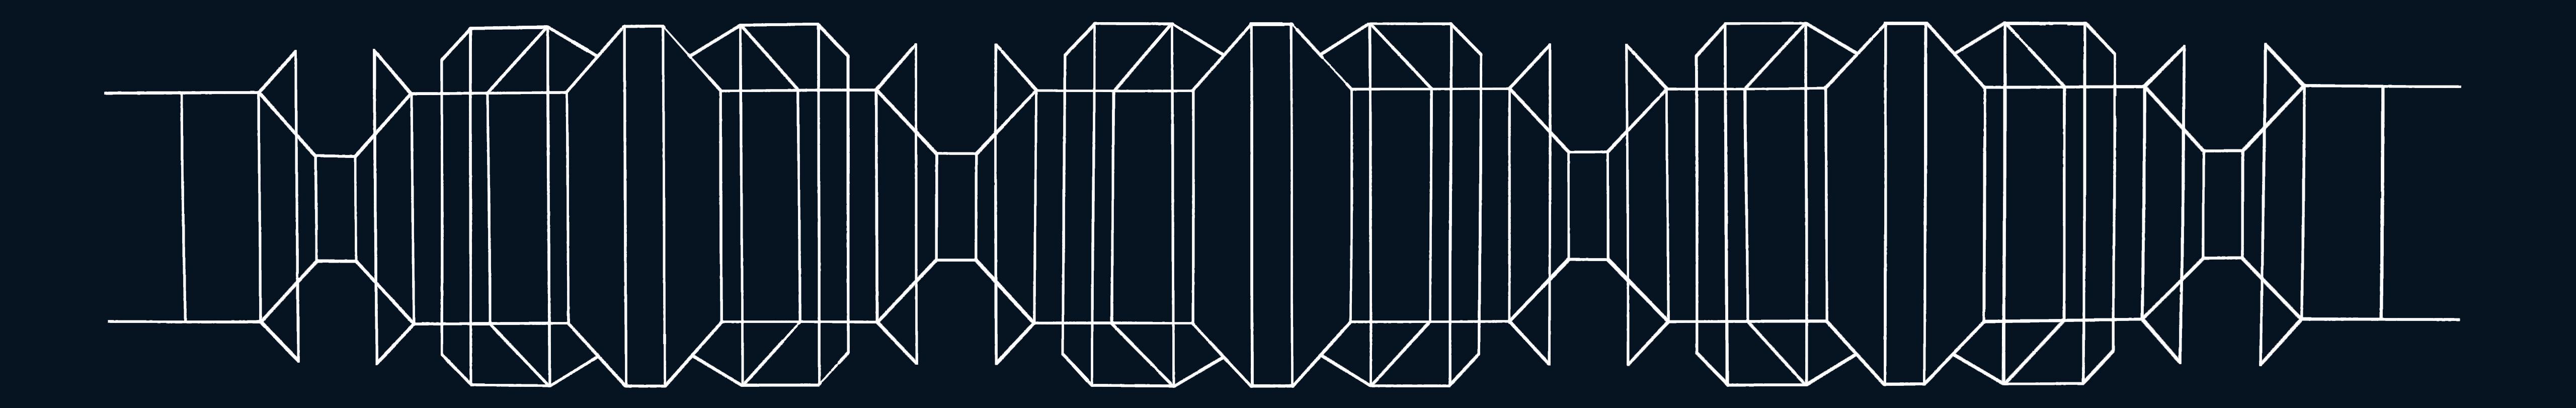 Las puertas de Sirio III / Sirio's Doors III